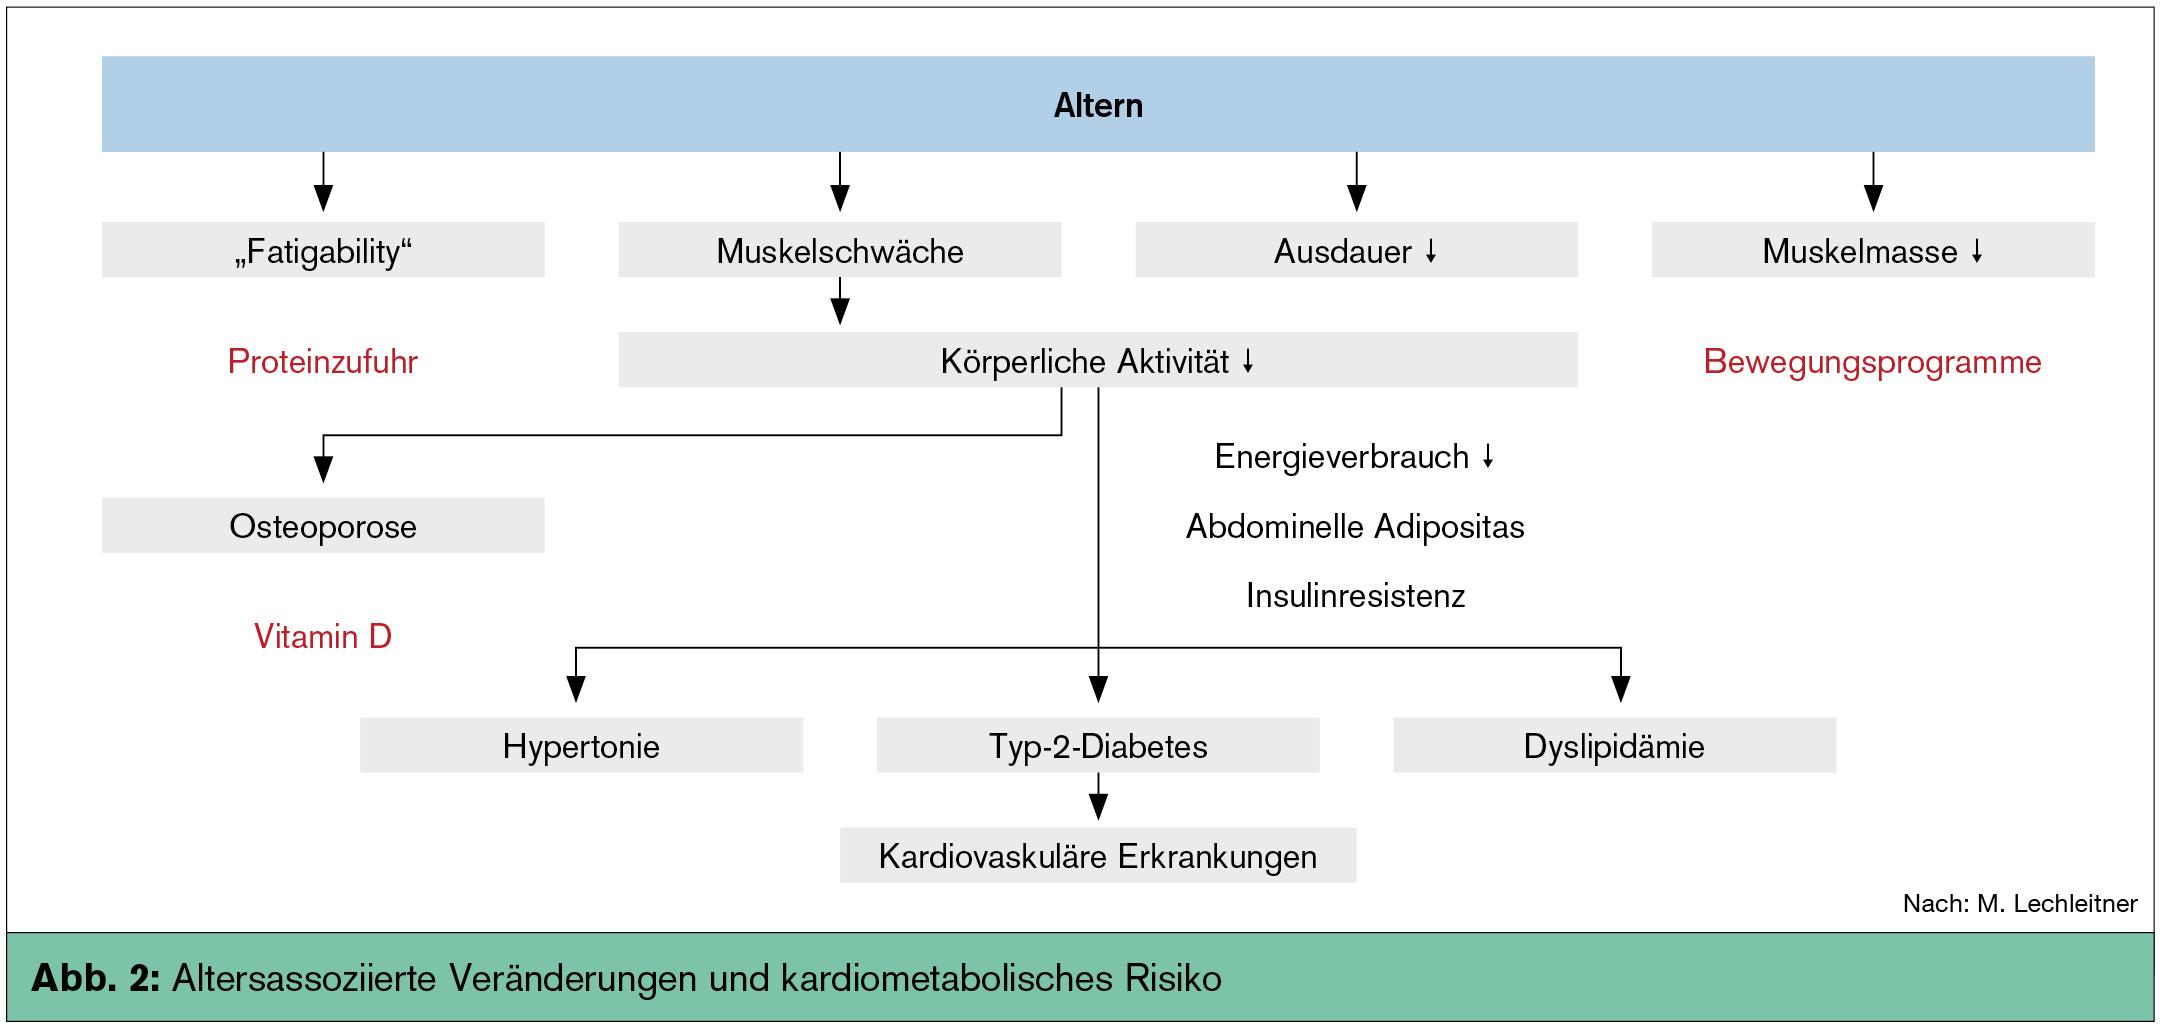 metabolisches alter tanita